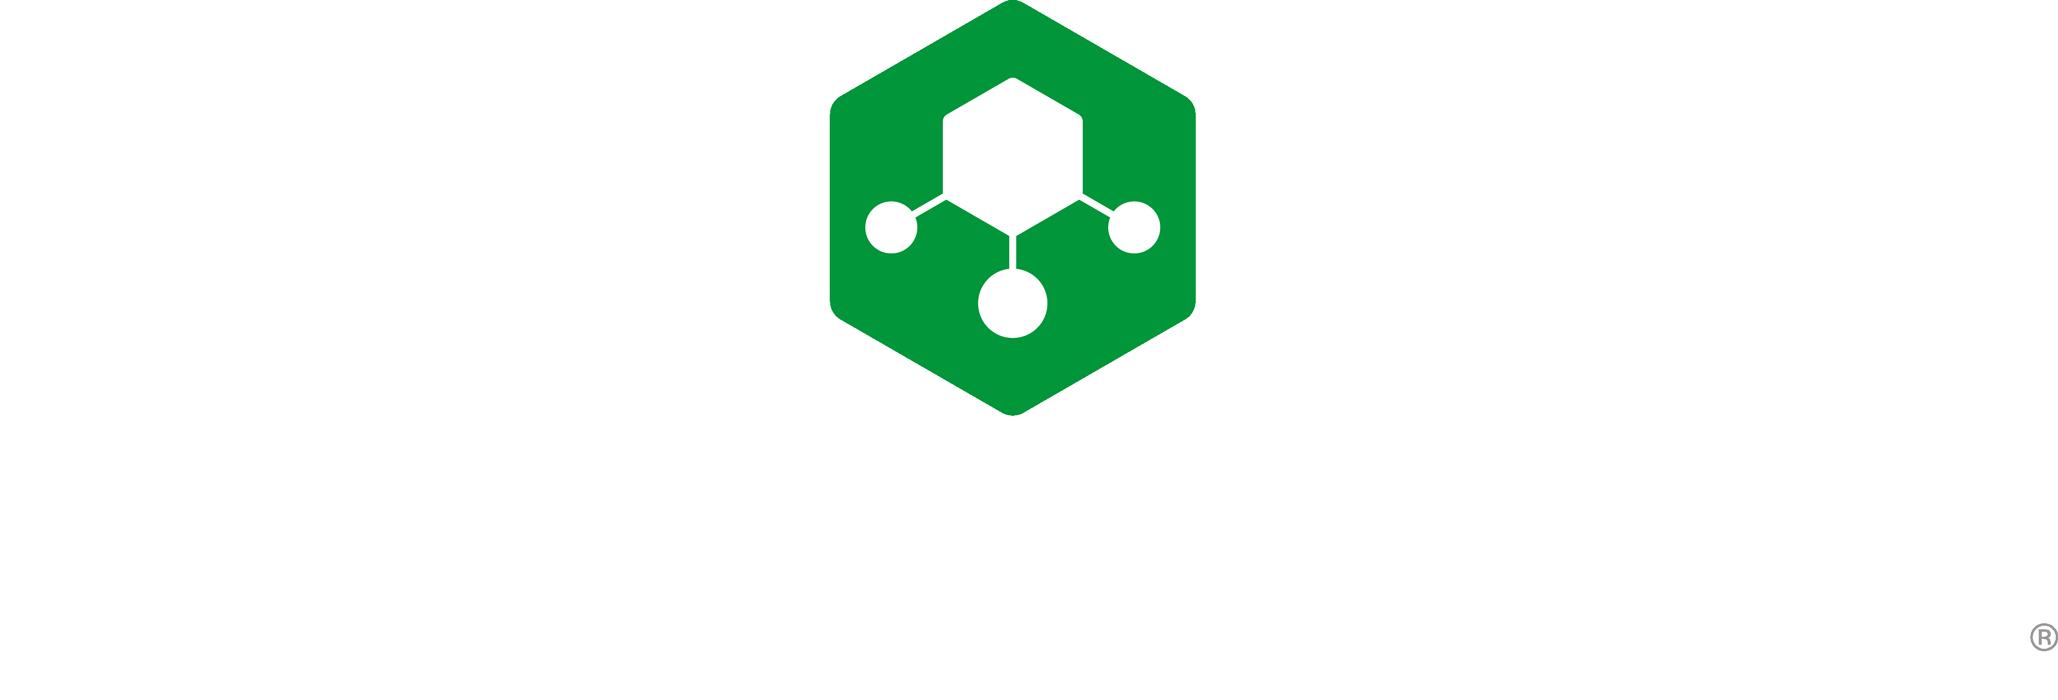 Logo des NGINX Instance Manager als Teil des NGINX Produktportfolios